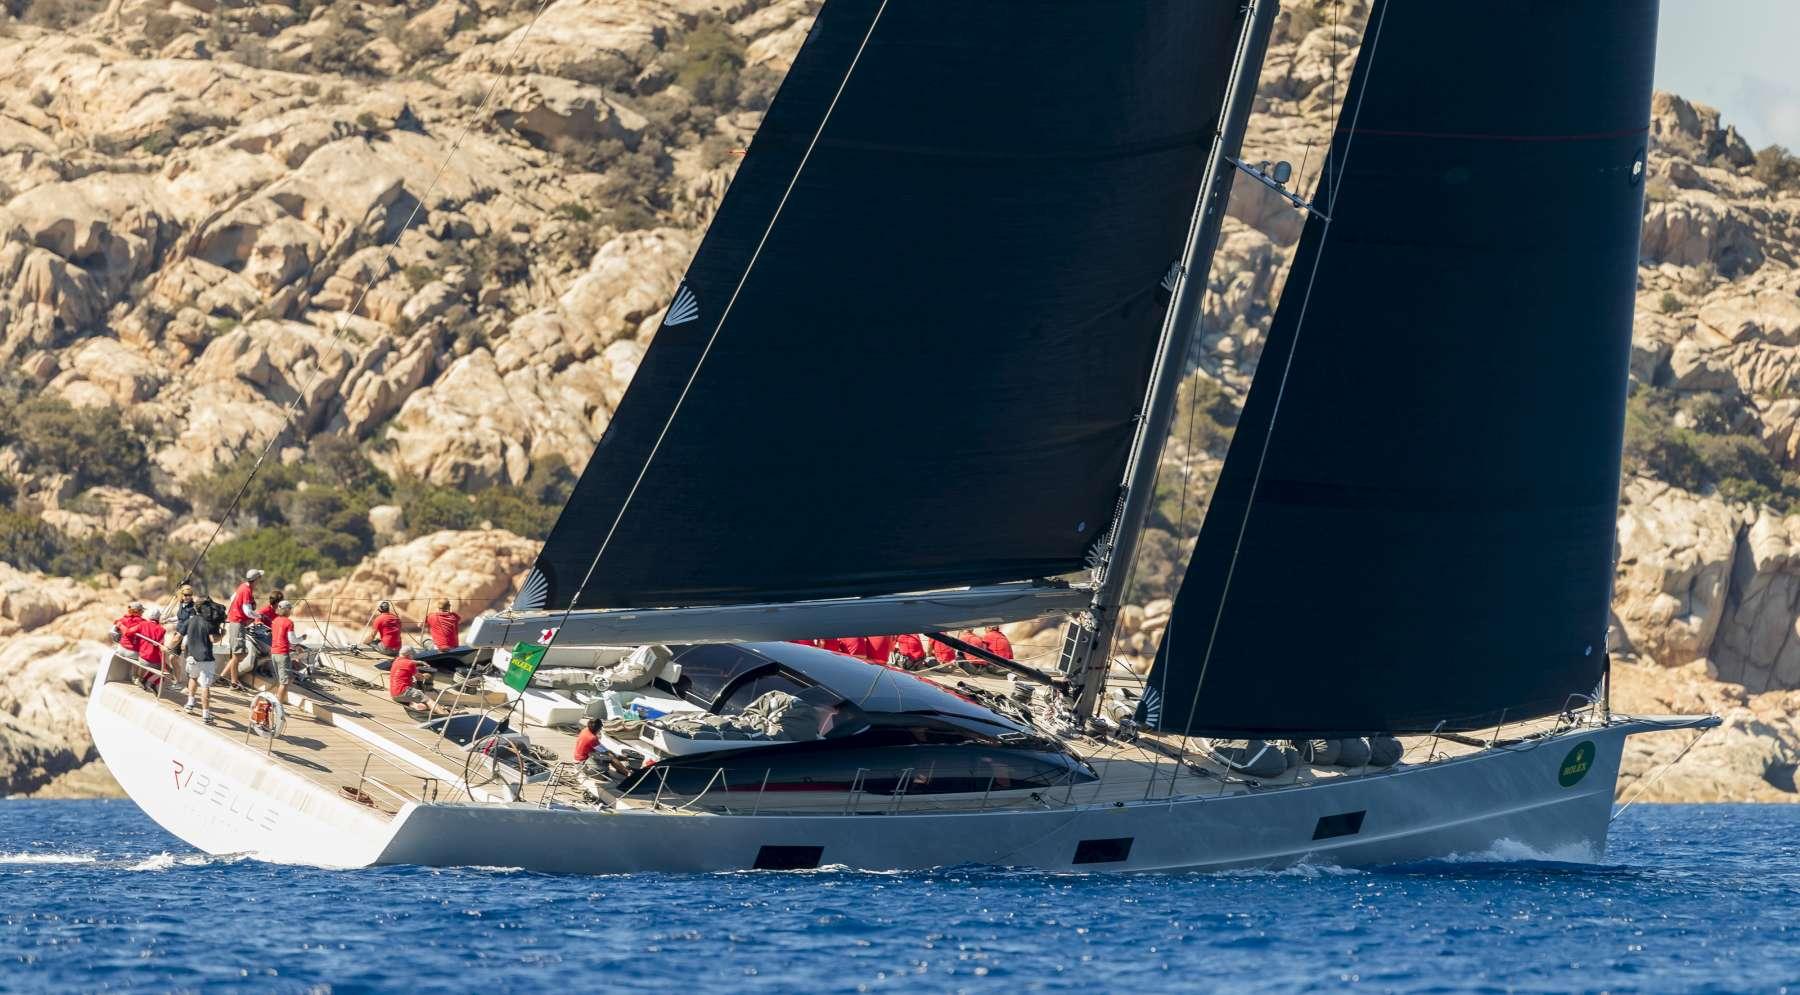 Maxi Yacht Rolex Cup 05 09 2017 Borlenghi 01